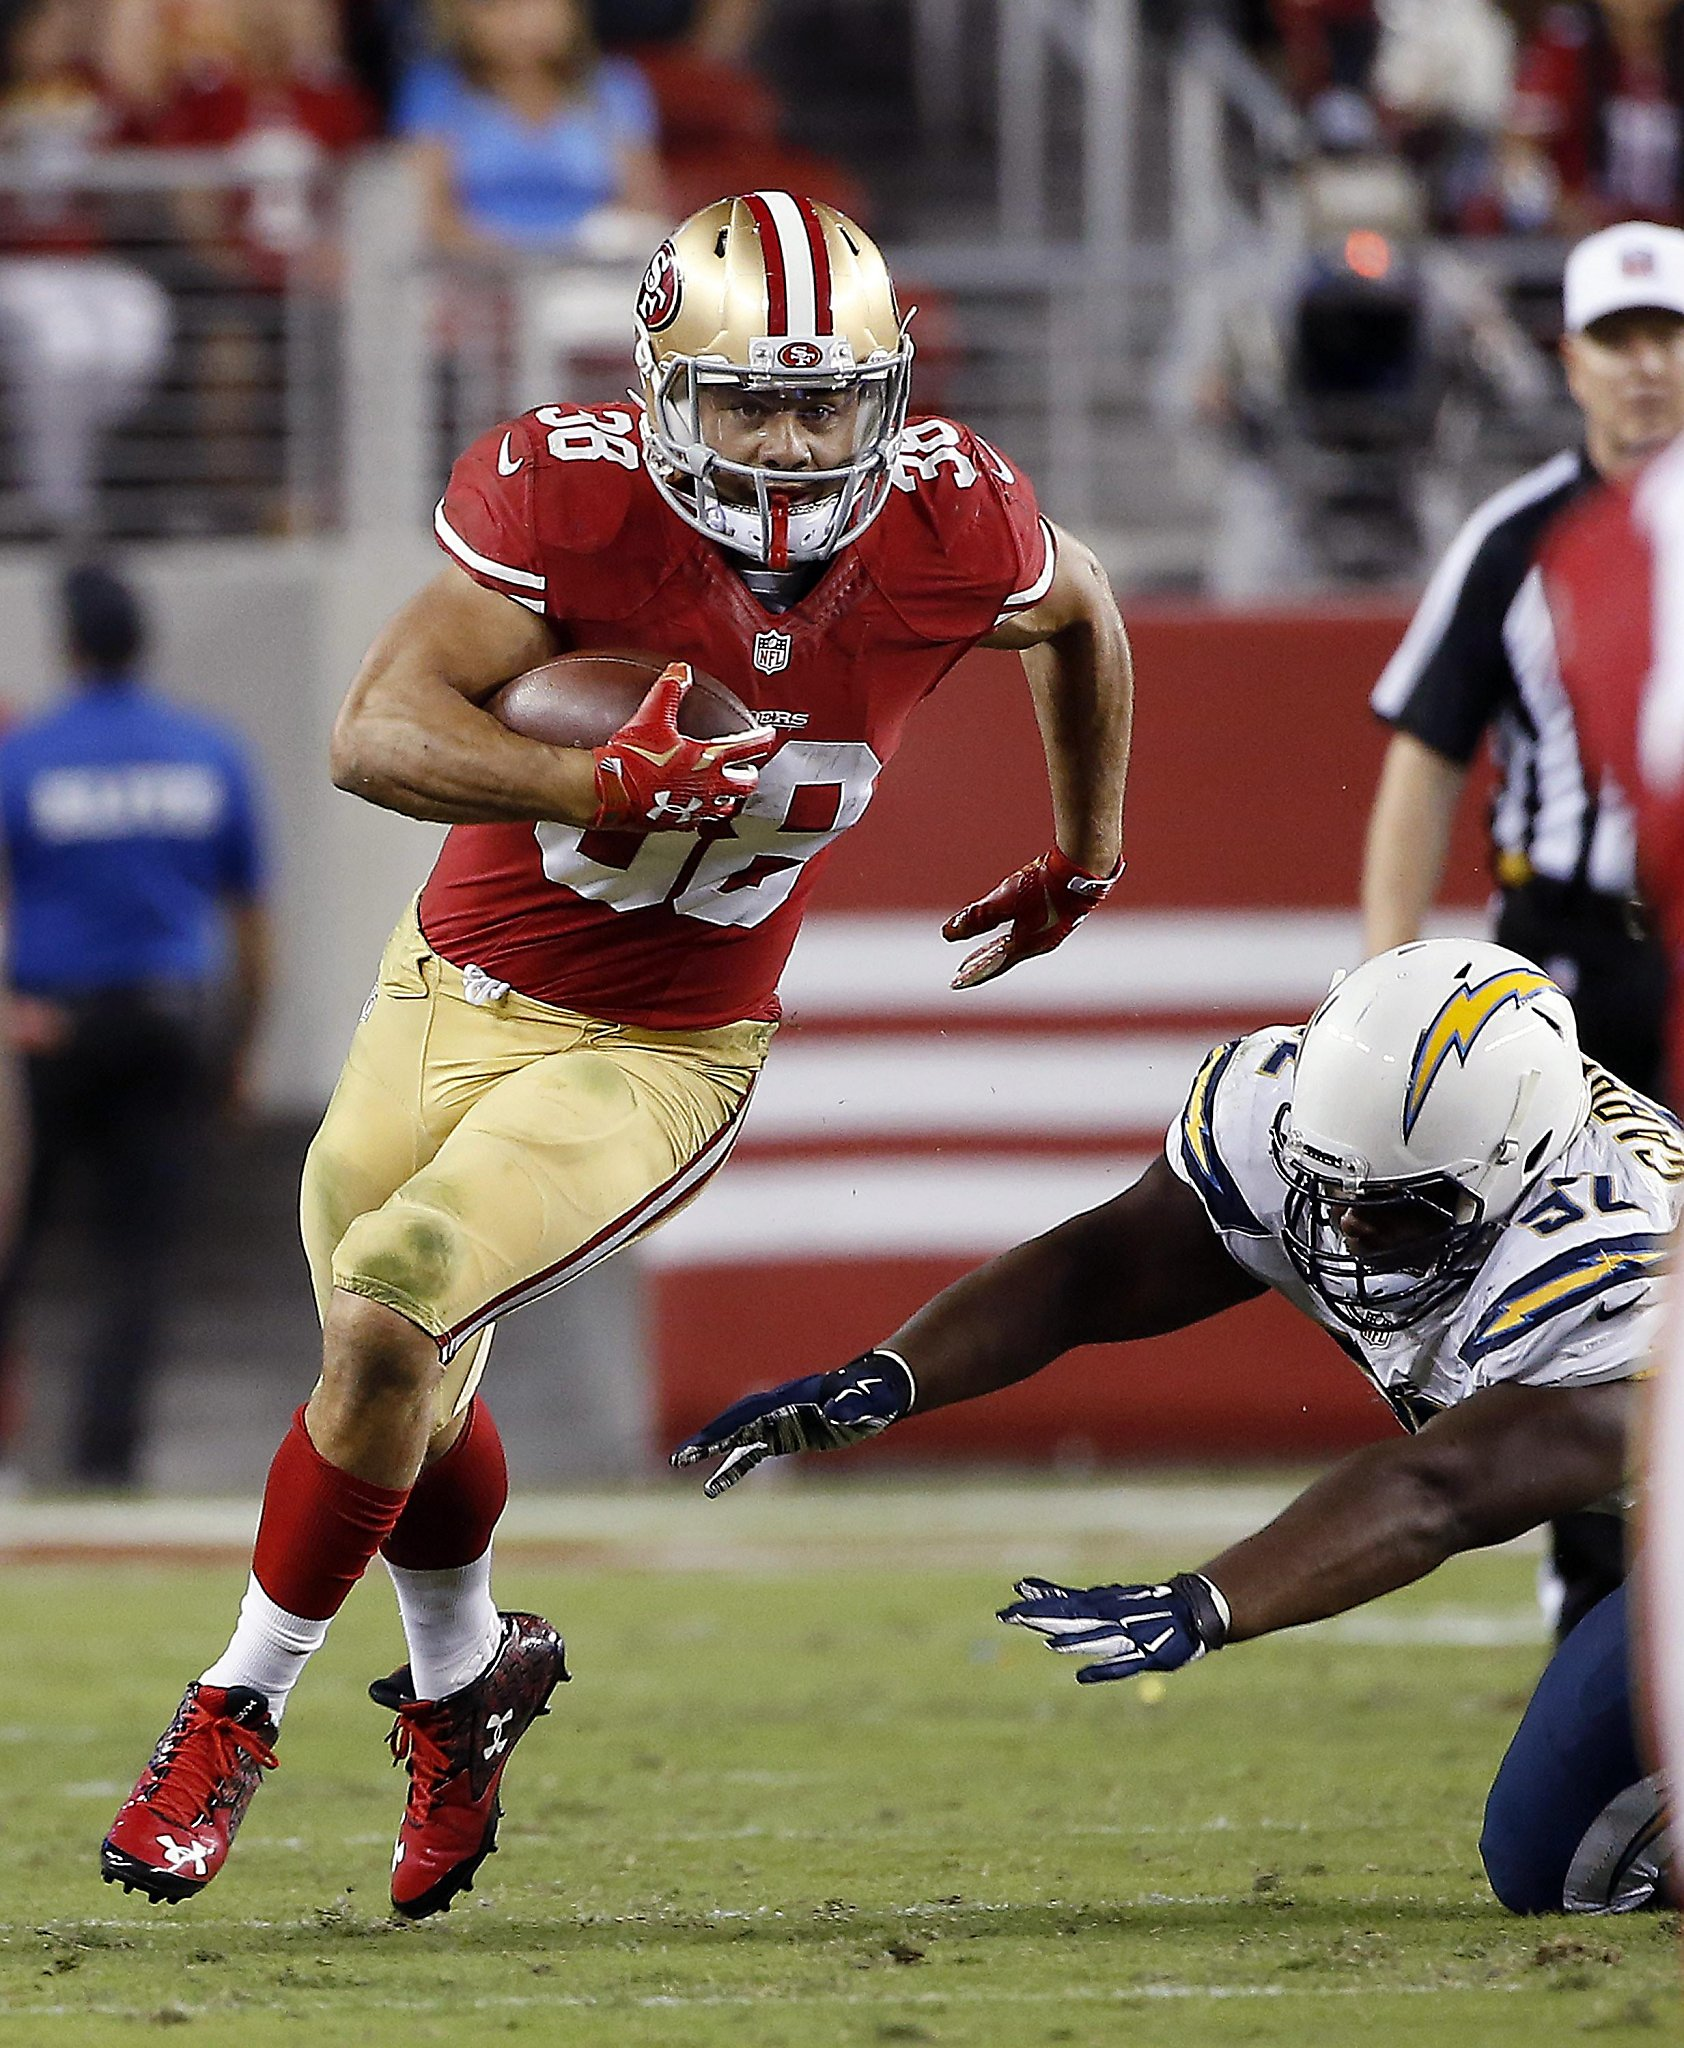 74962b0a971 49ers' Hayne announces NFL retirement - SFGate